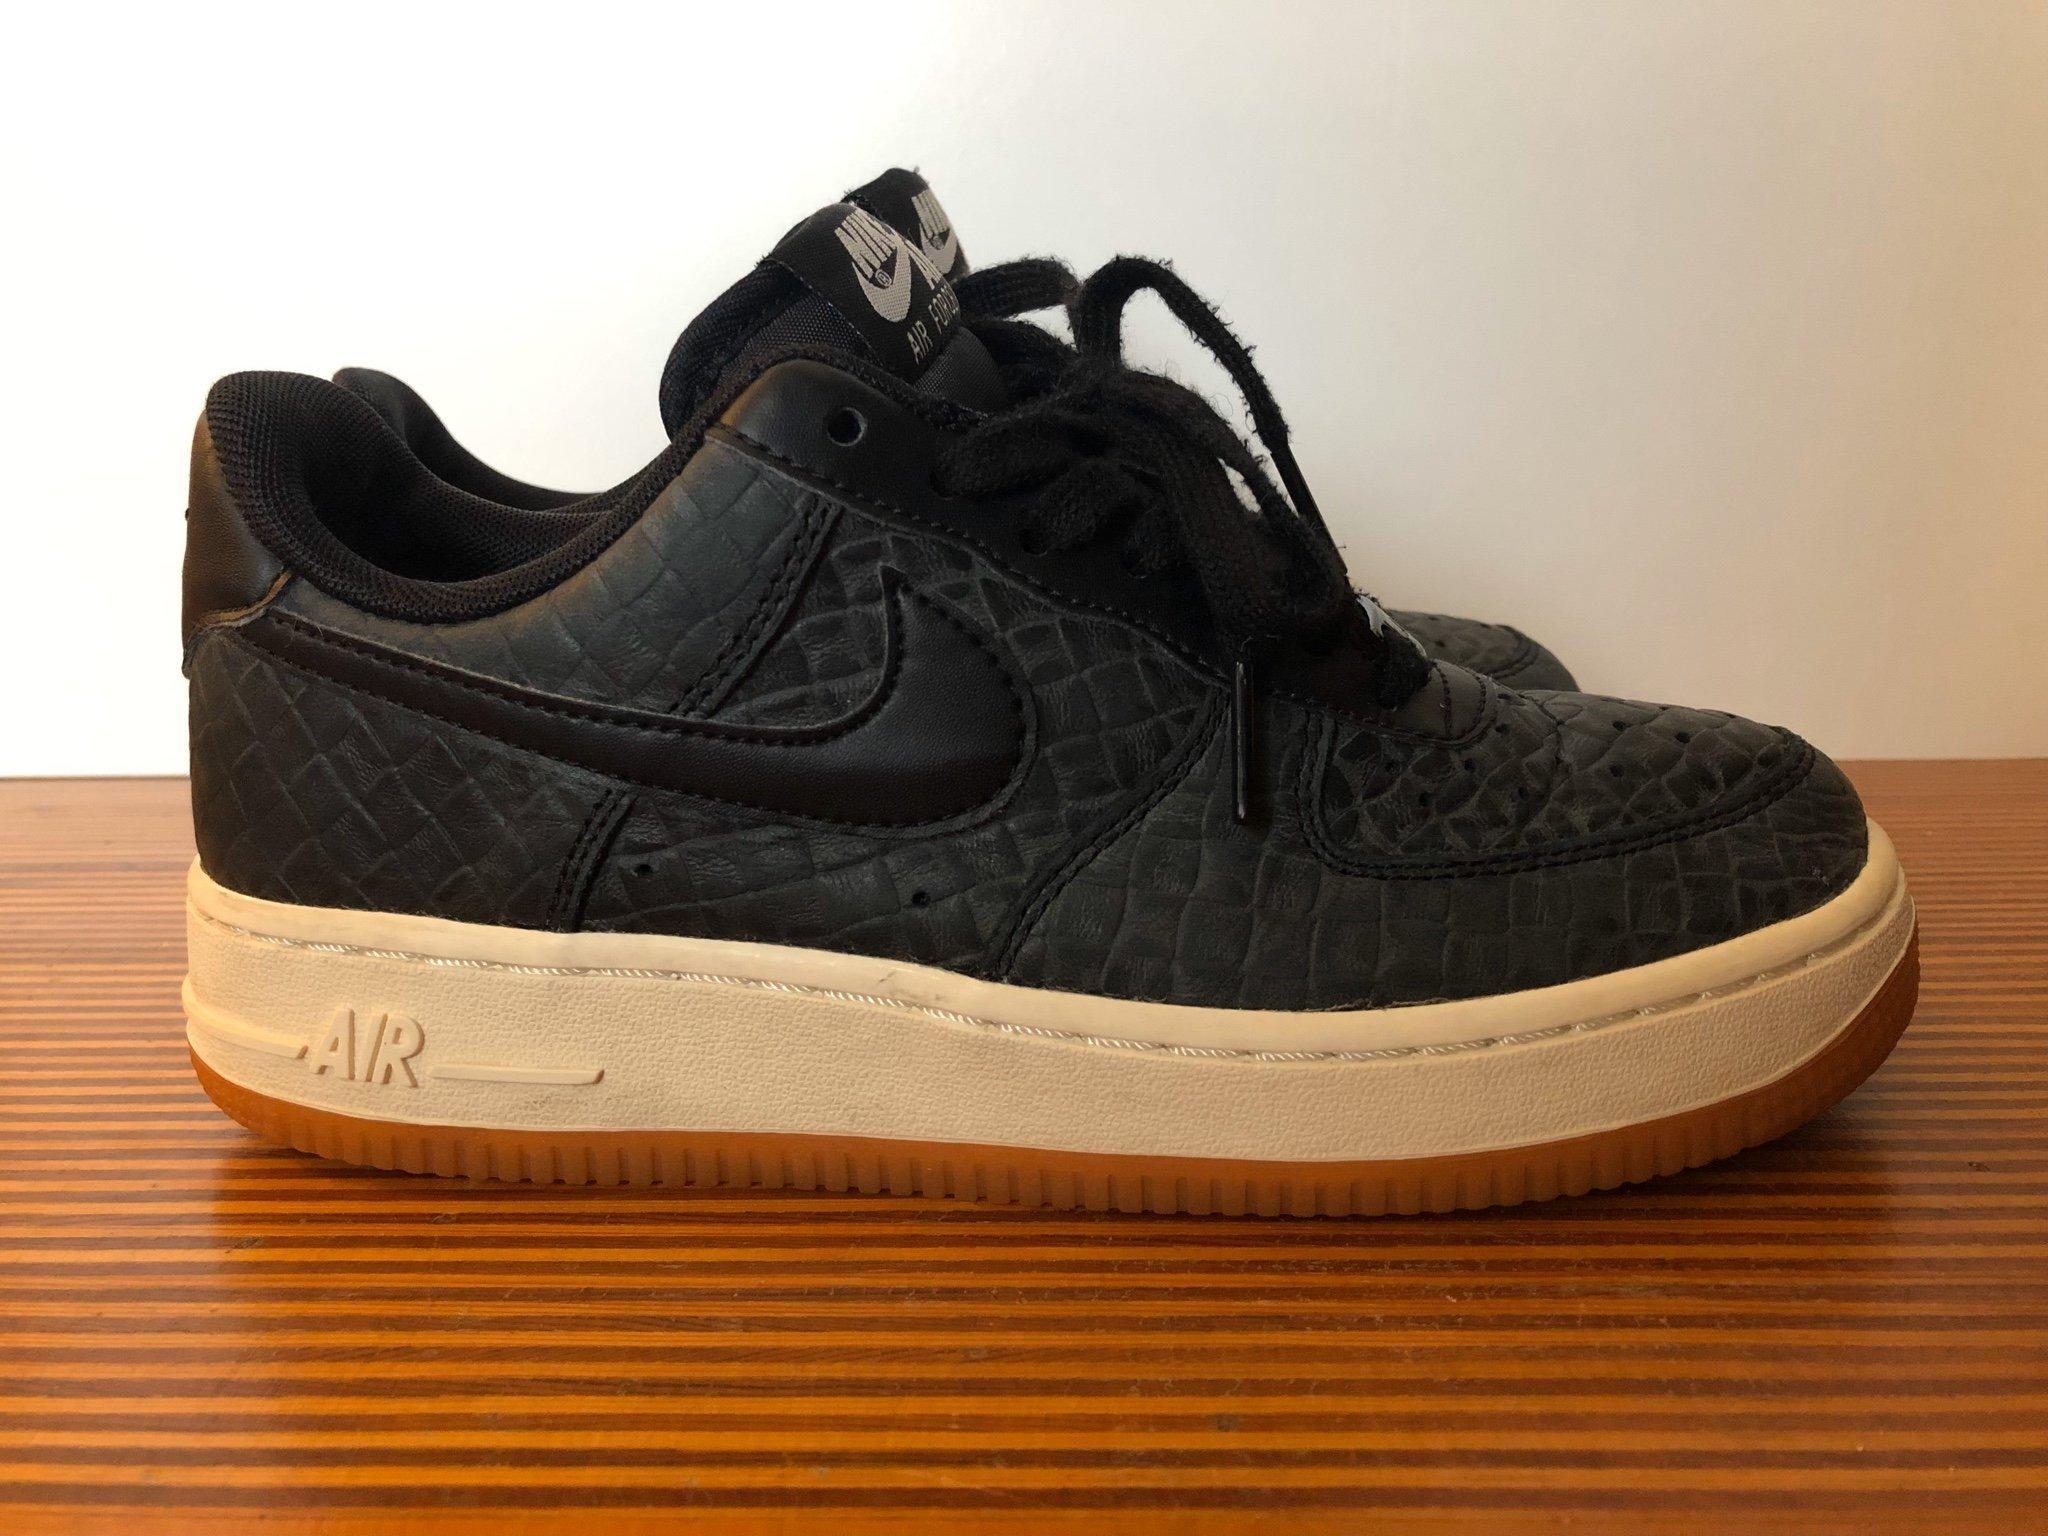 Nike Air Force 1 Premium, storlek 36,5 (passar liten 37)